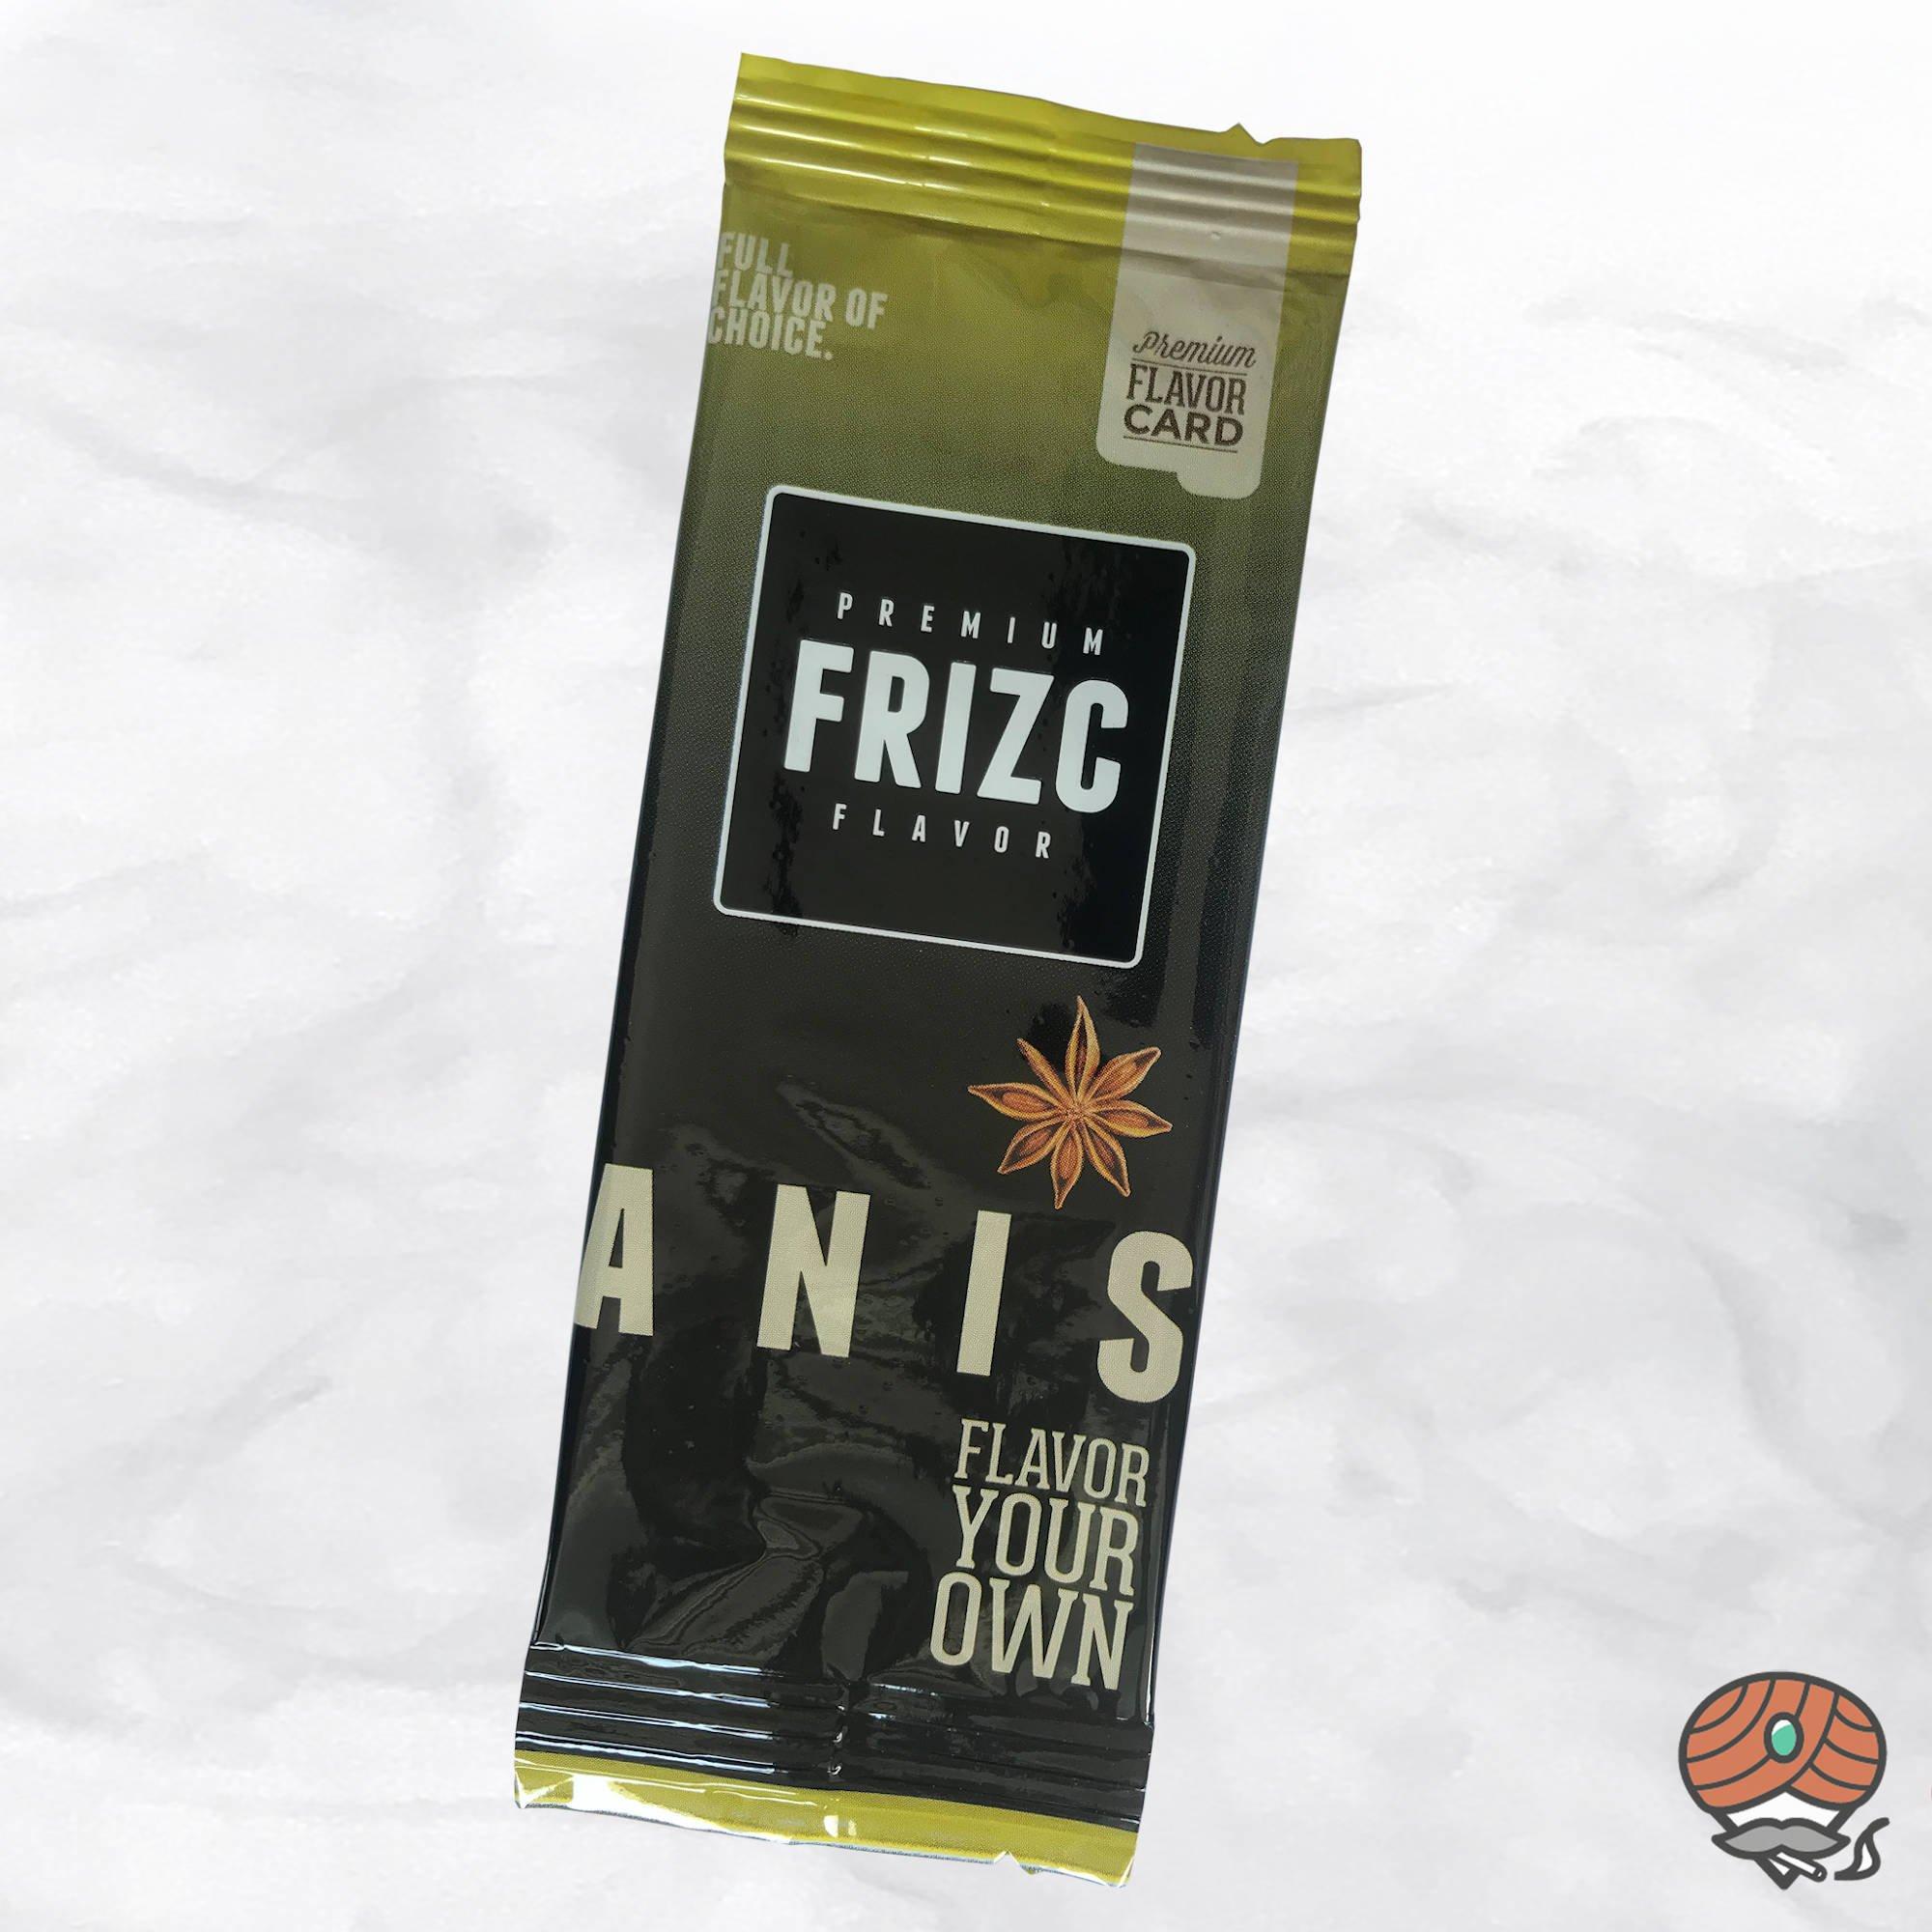 Aromakarte Frizc Anis - Premium Flavor Card